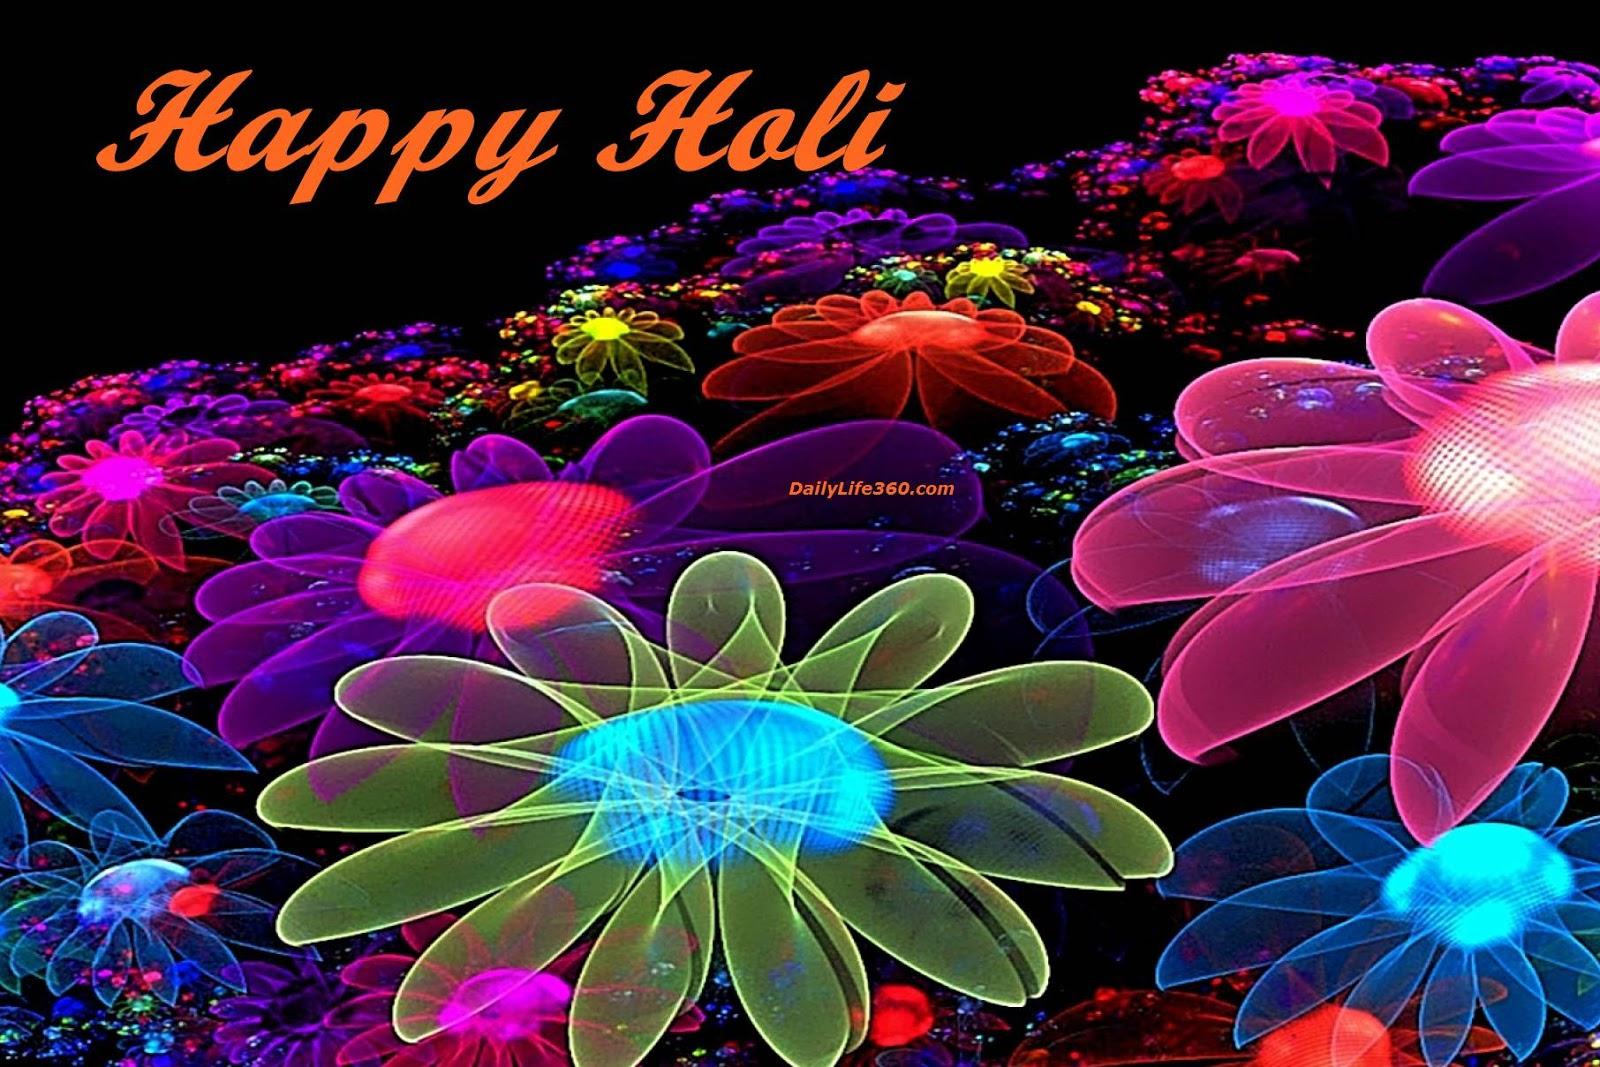 Holi Images Photo Graphics Hd Whatsapp Facebook Share Wallpaper Dp